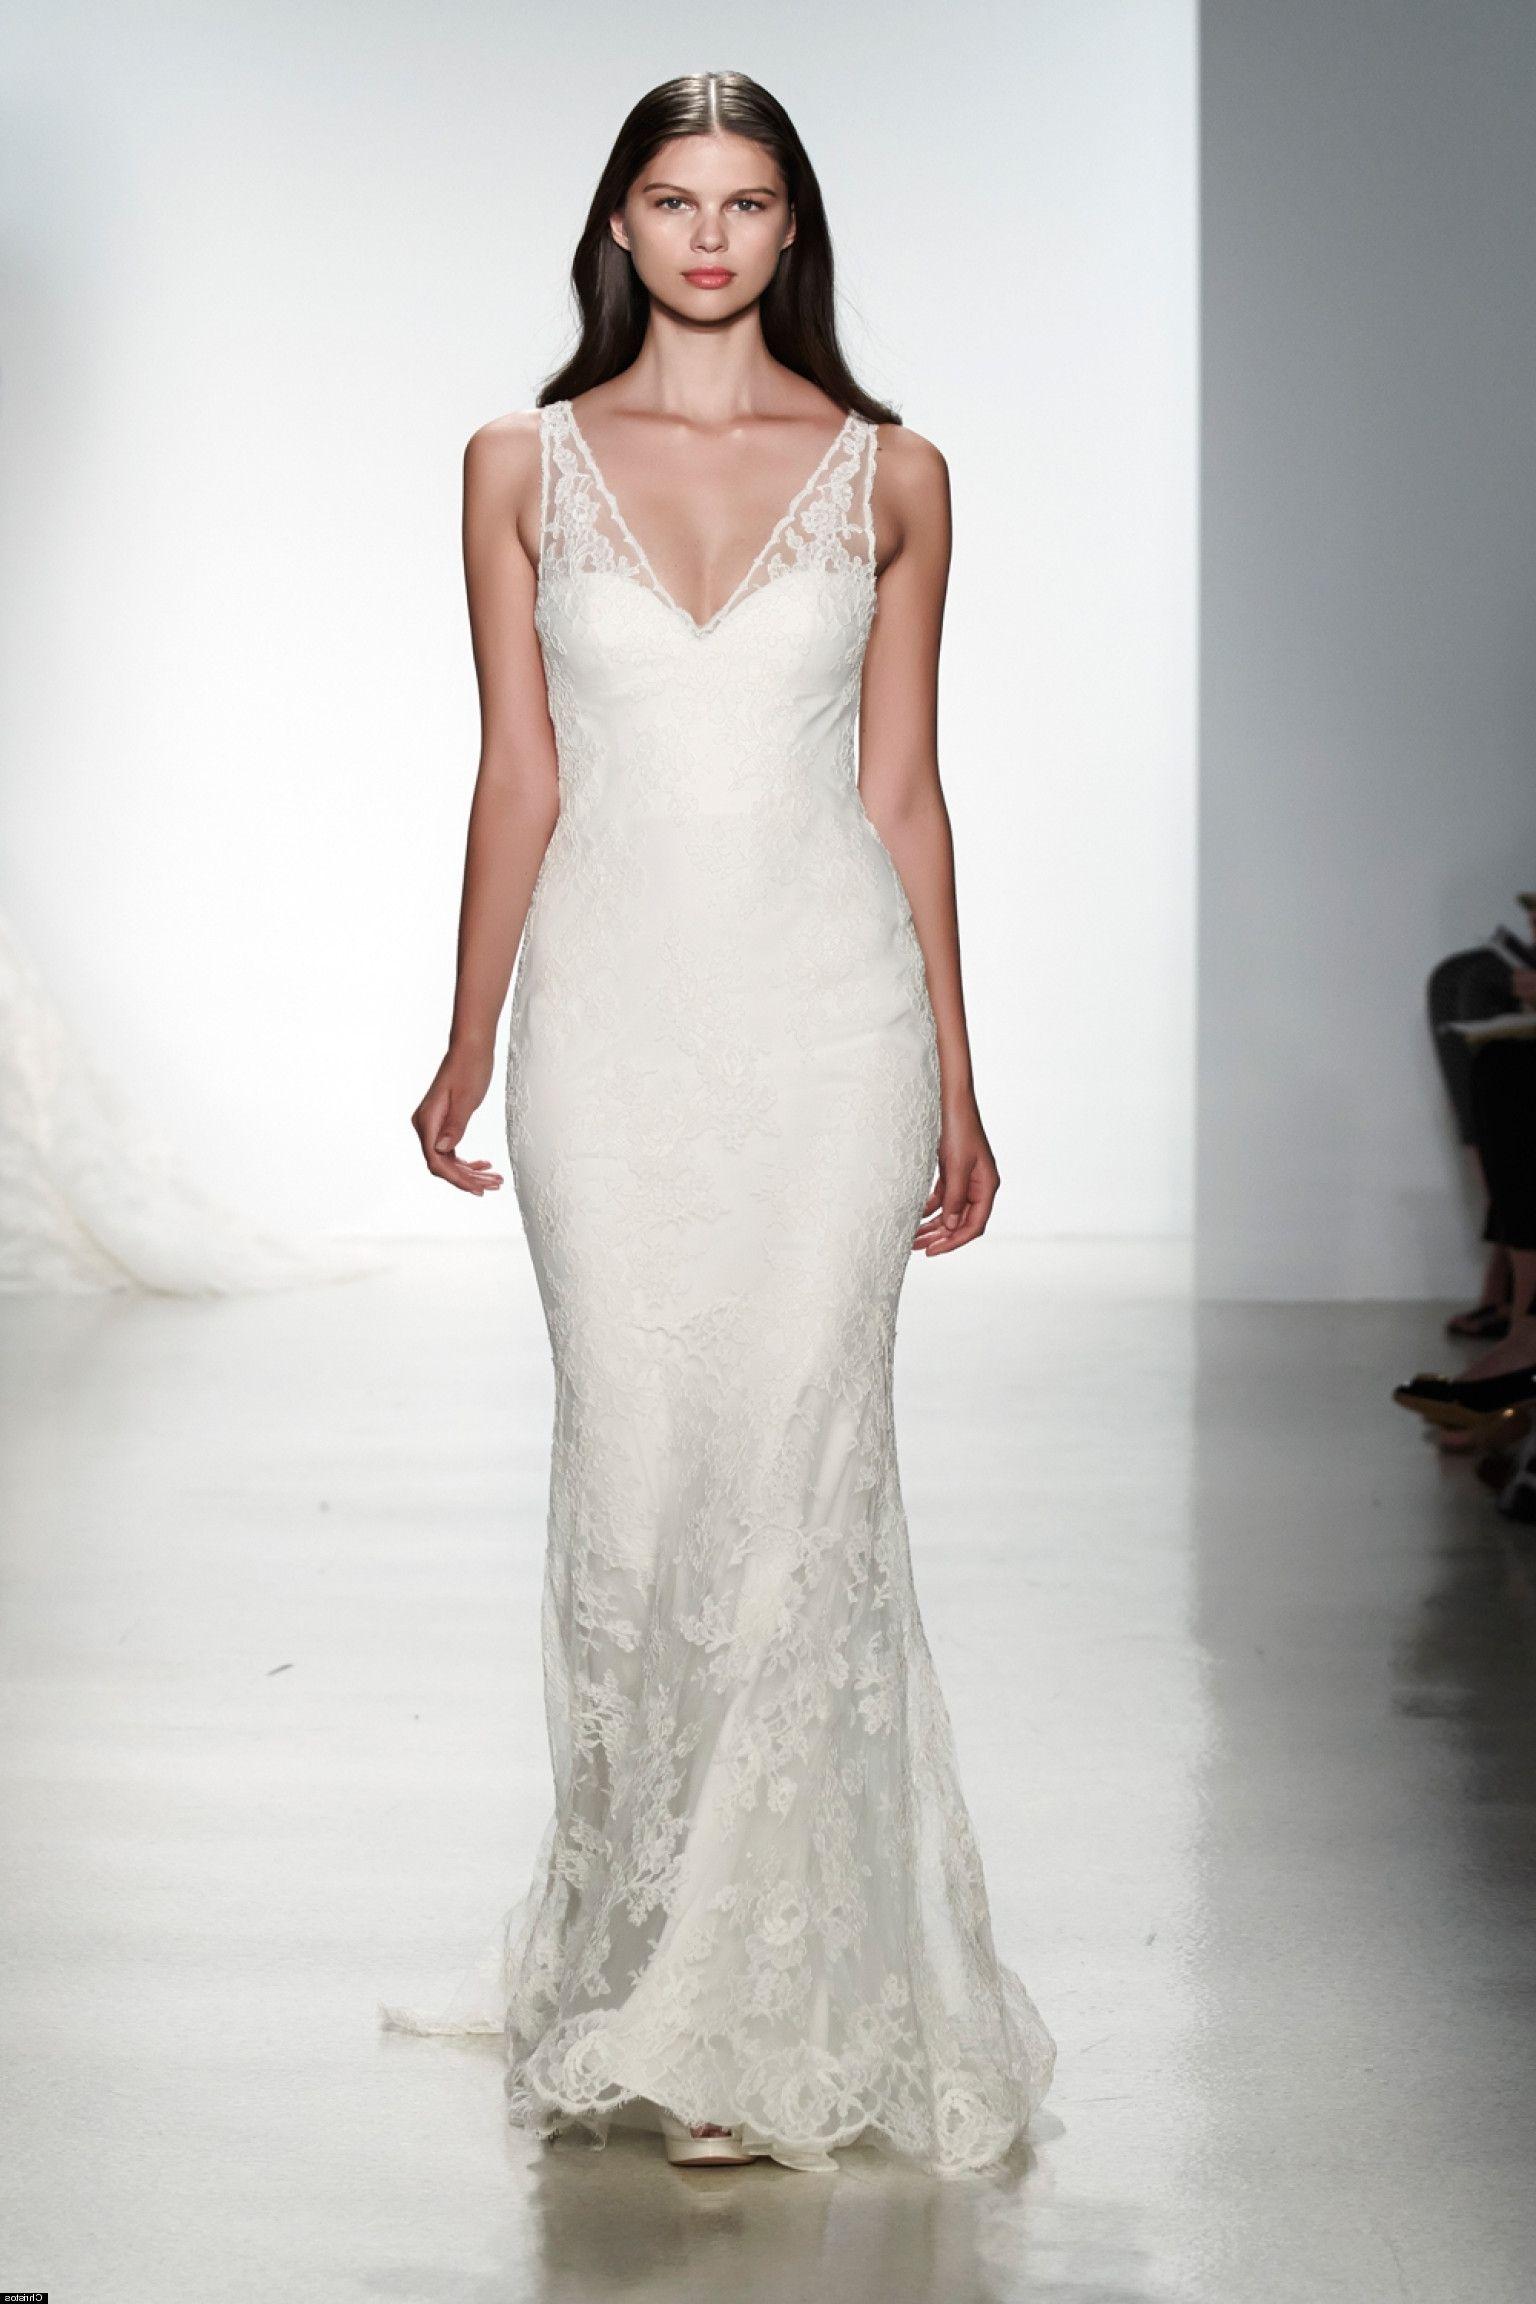 Best Wedding Dress Silhouette For Short Brides Best Wedding Dresses Crop Top Wedding Dress Dresses